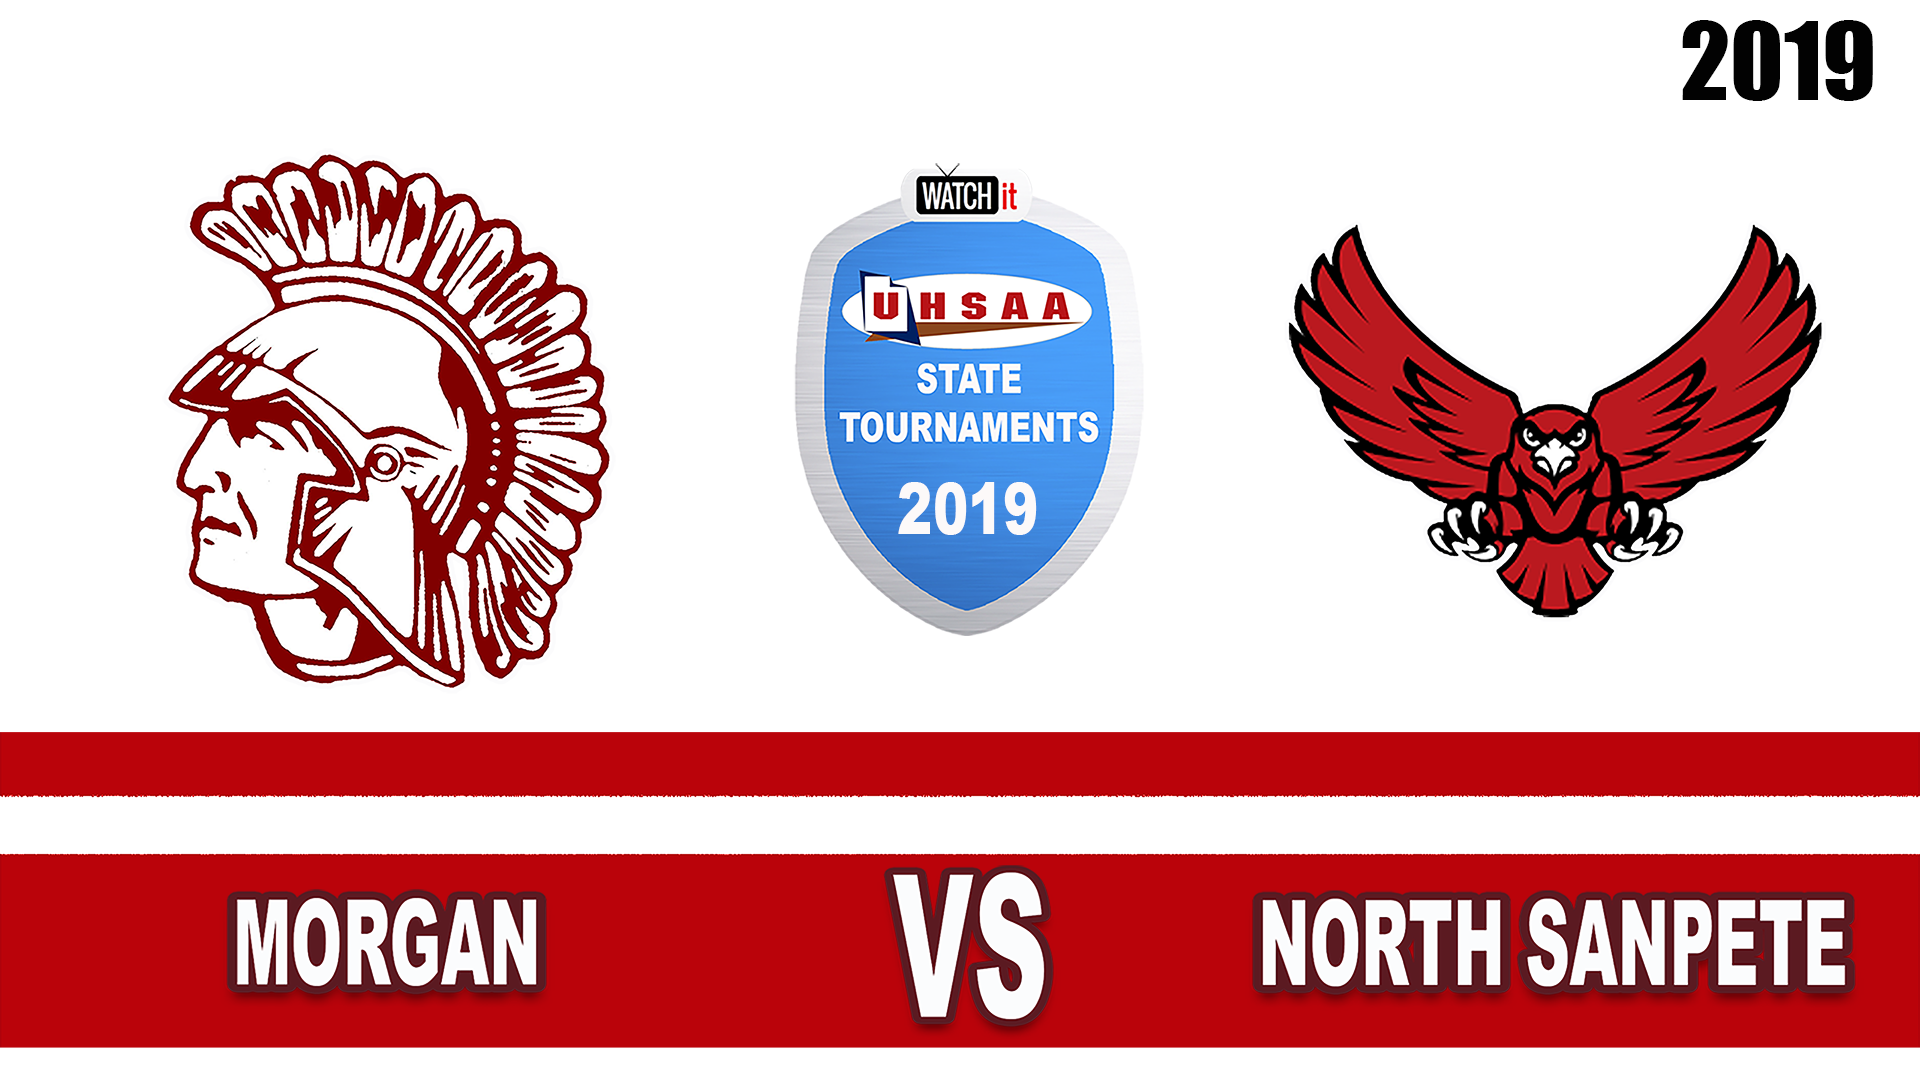 Morgan vs North Sanpete